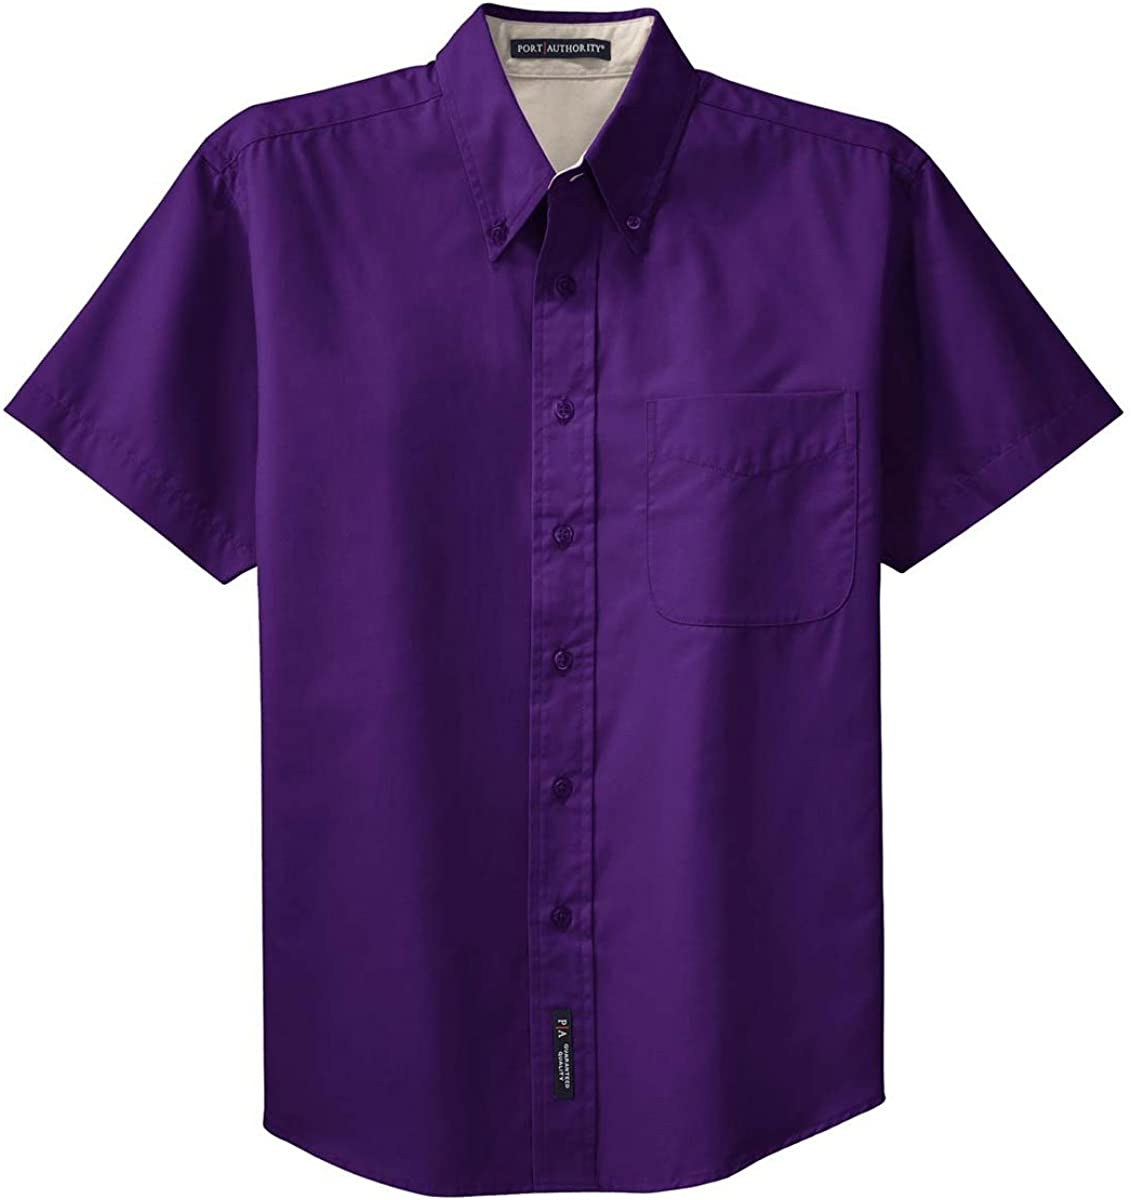 Port Authority Men's Big Short-Sleeve Easy Care Dress Shirt - Purple/Light Stone S508 XL